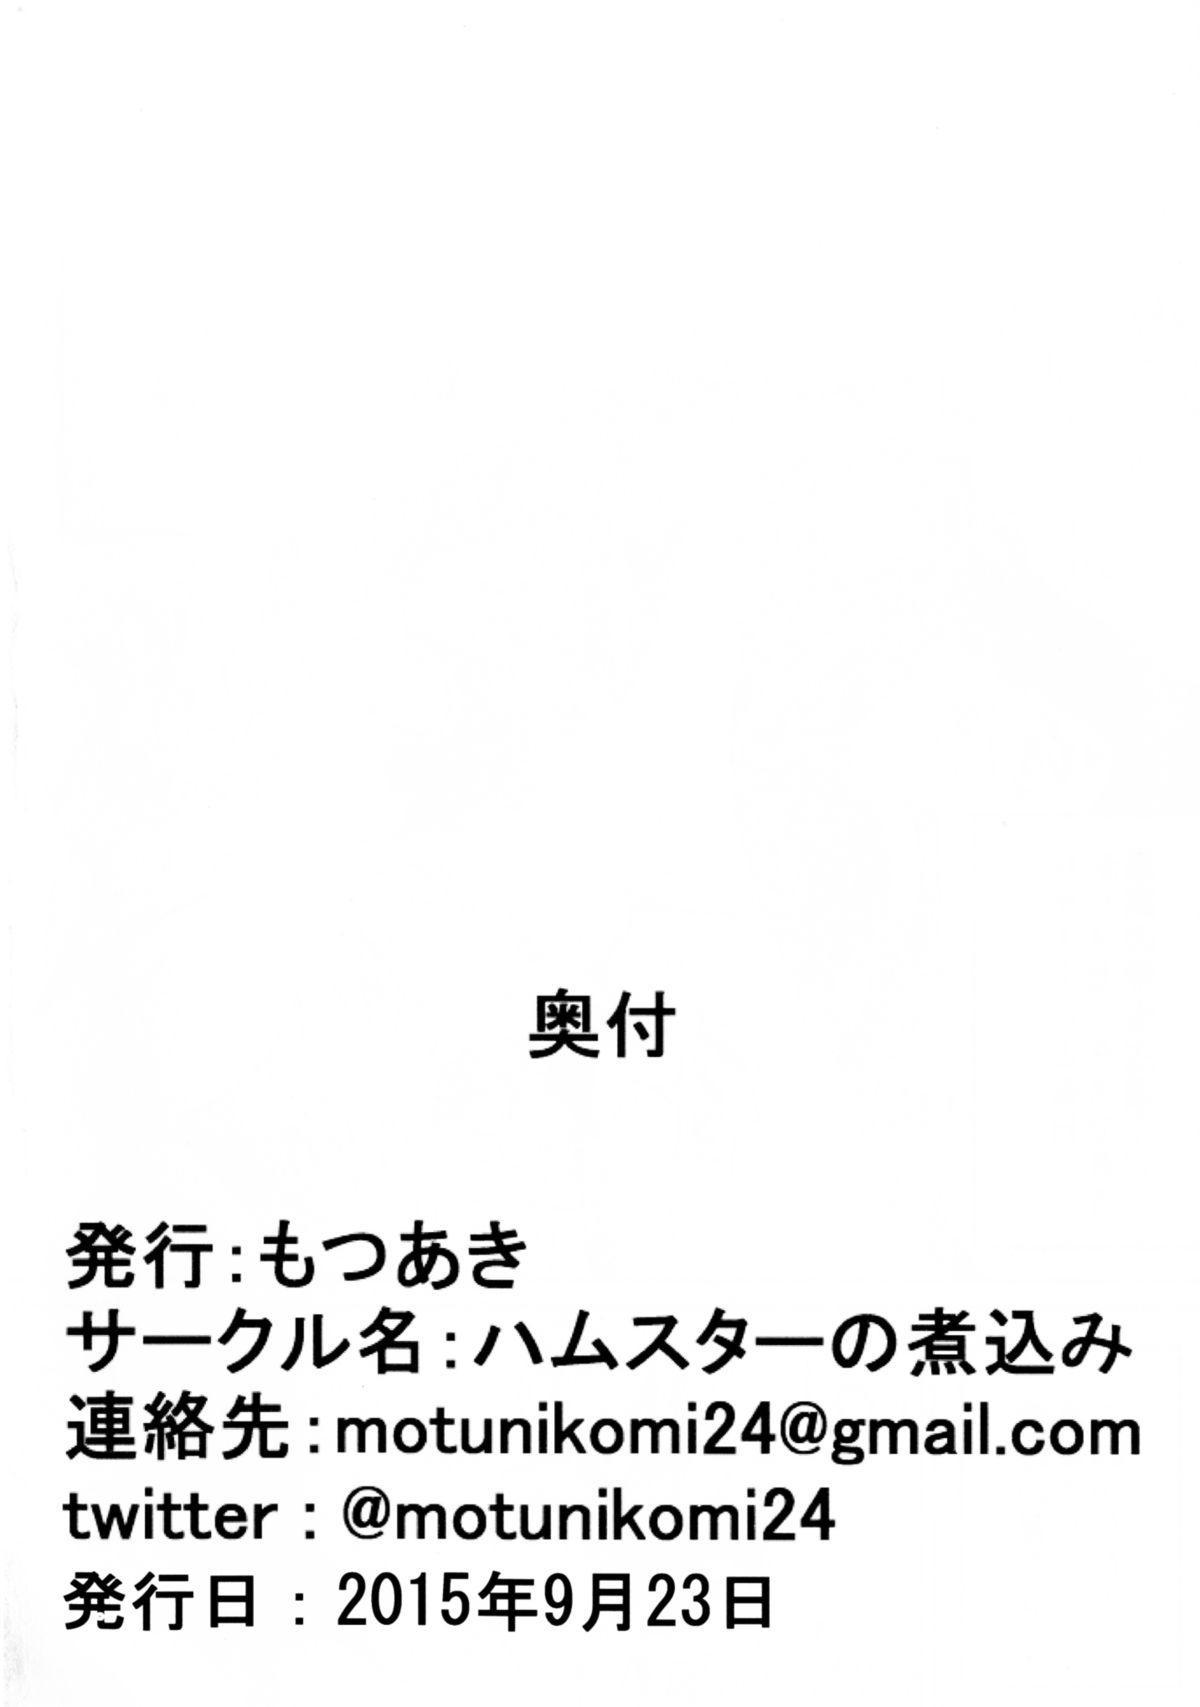 Suki suki daisuki Reona-kun2 28